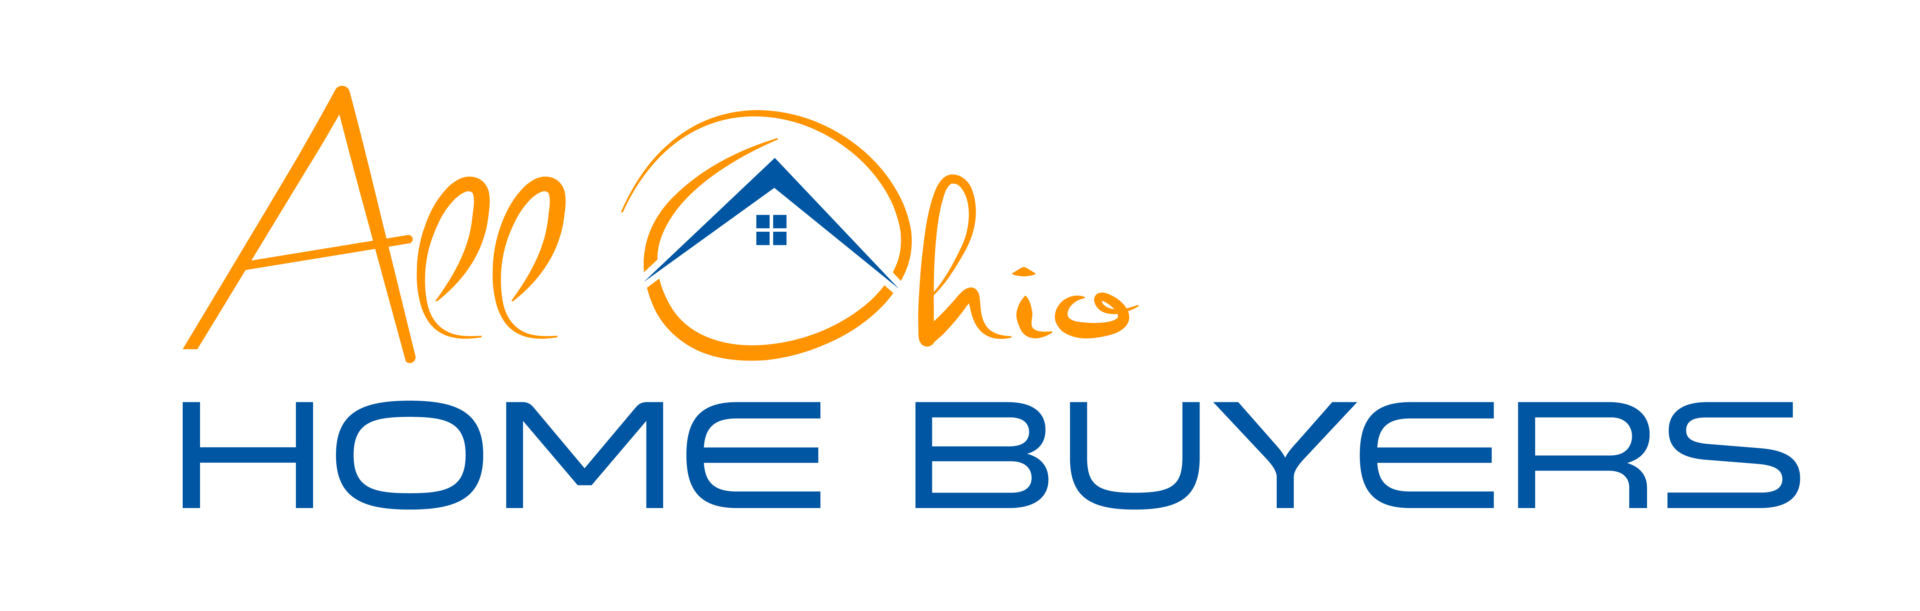 All Ohio Homebuyers logo